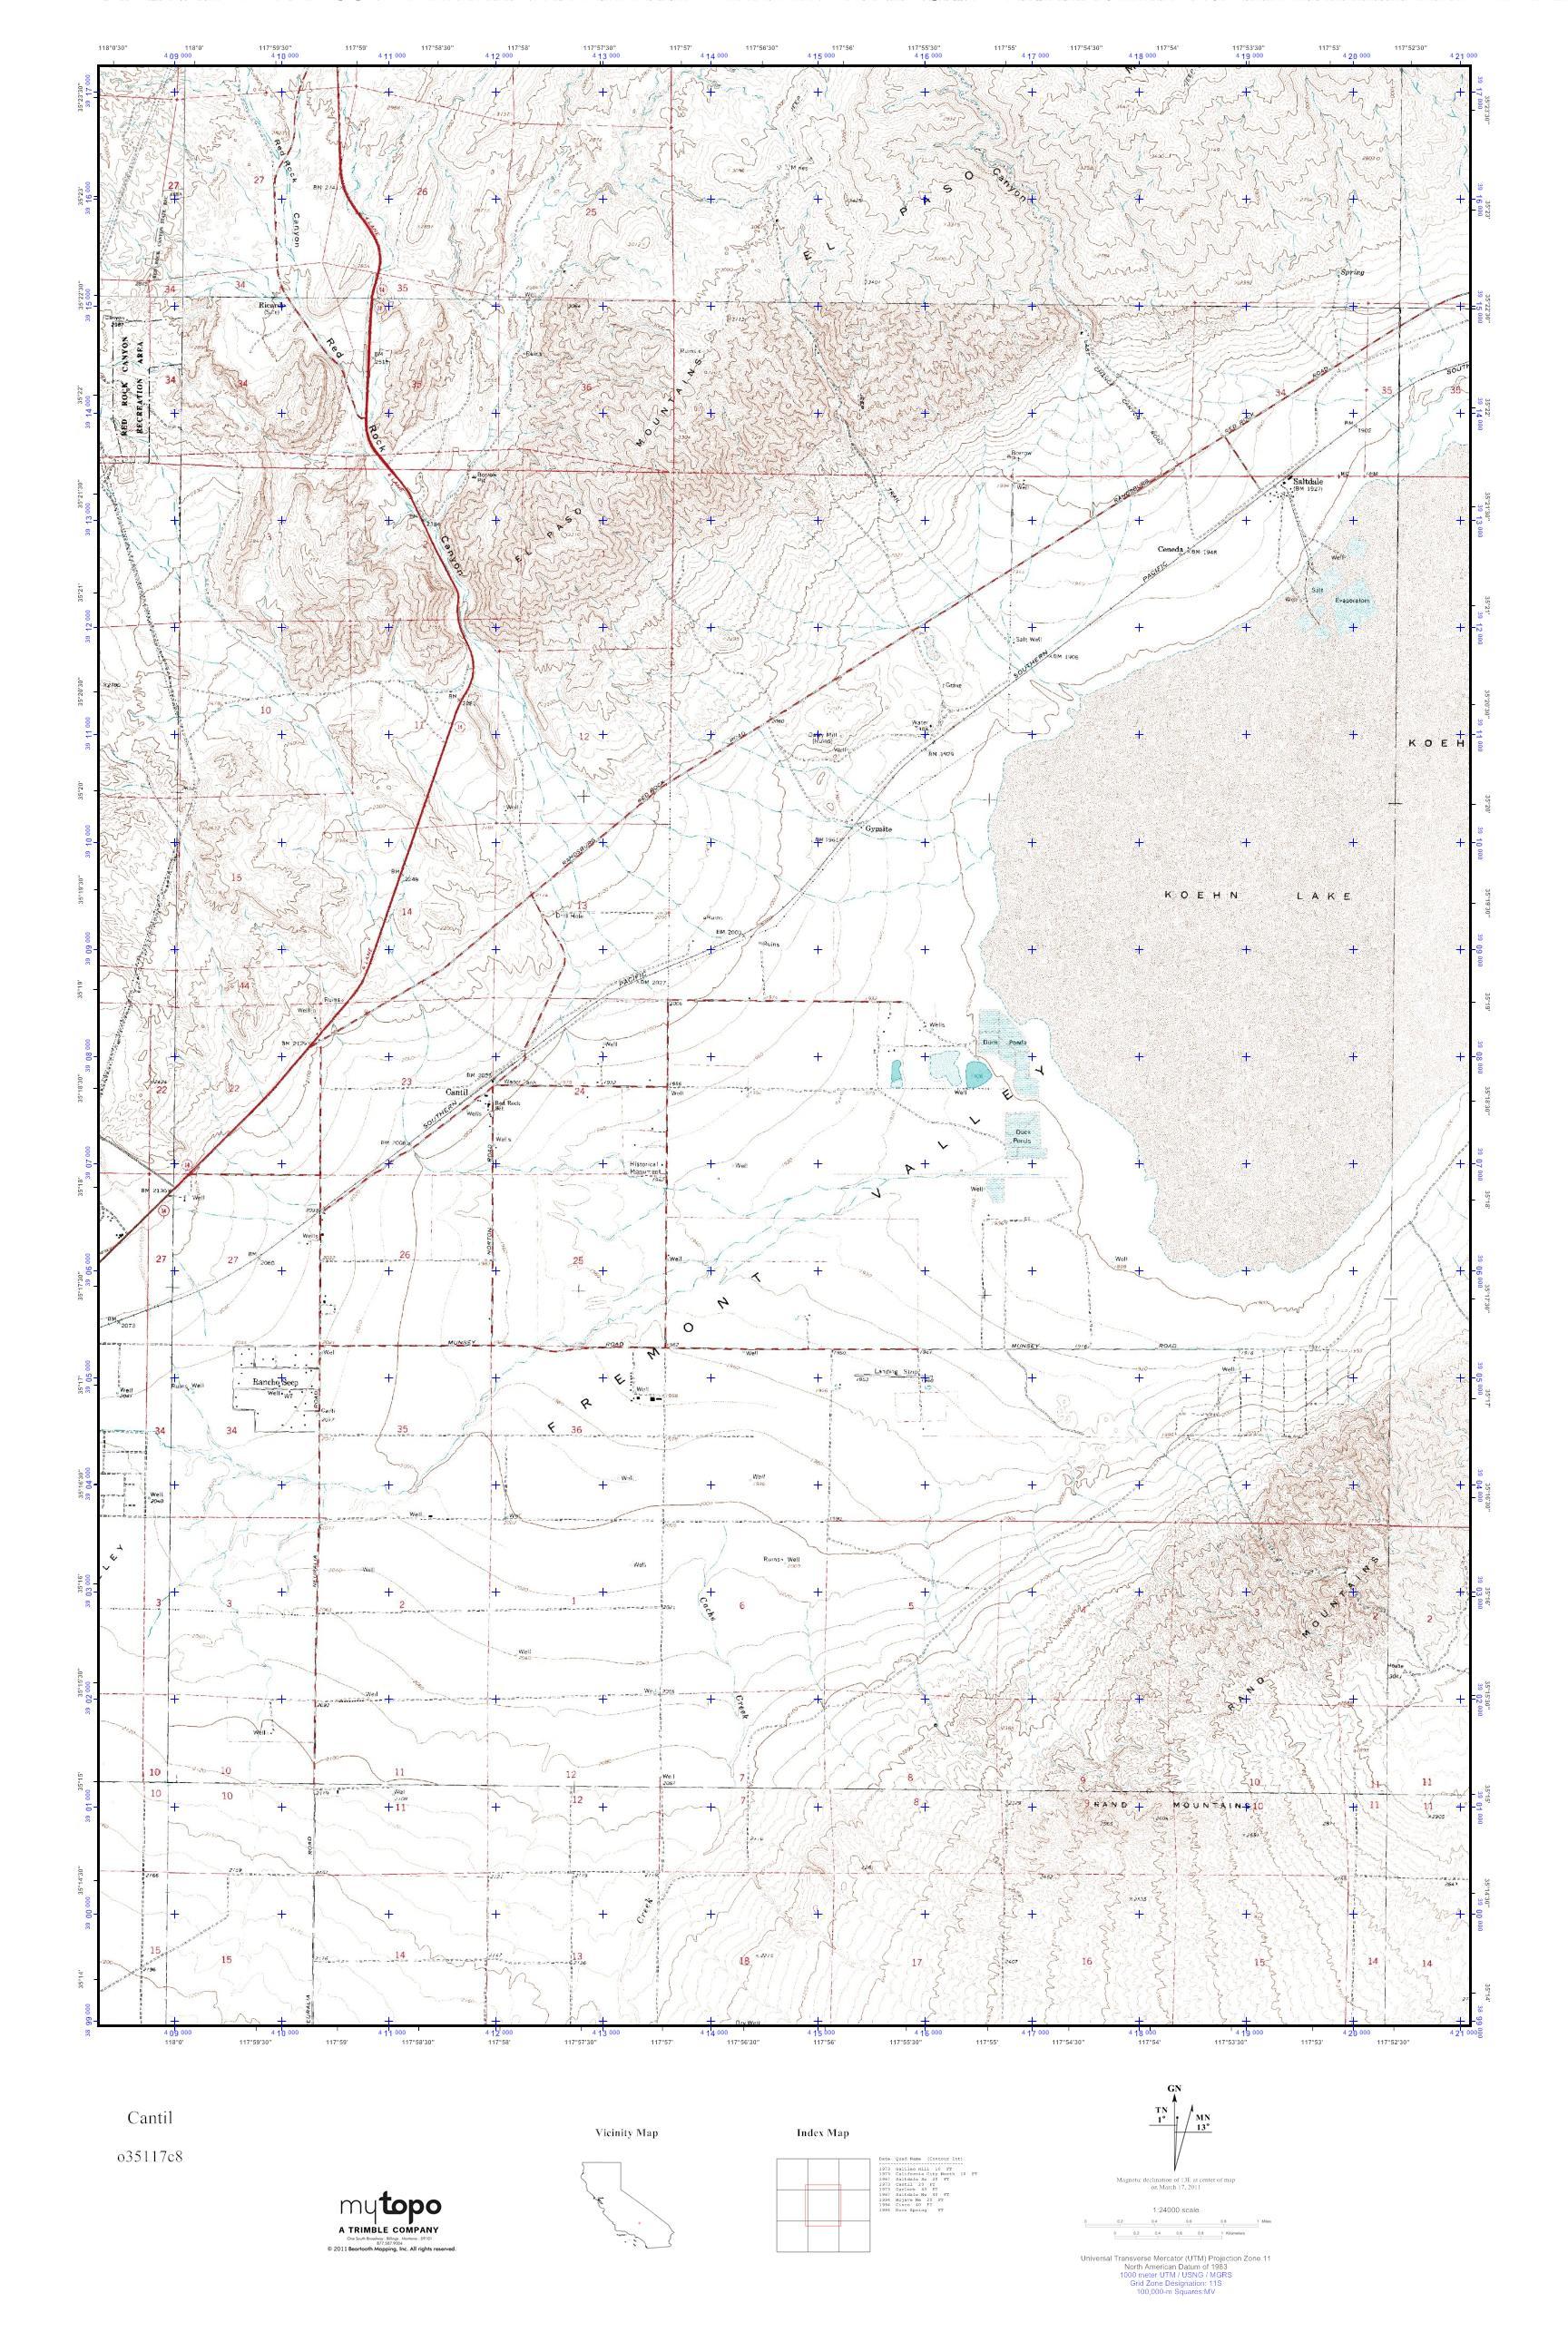 MyTopo Cantil, California USGS Quad Topo Map